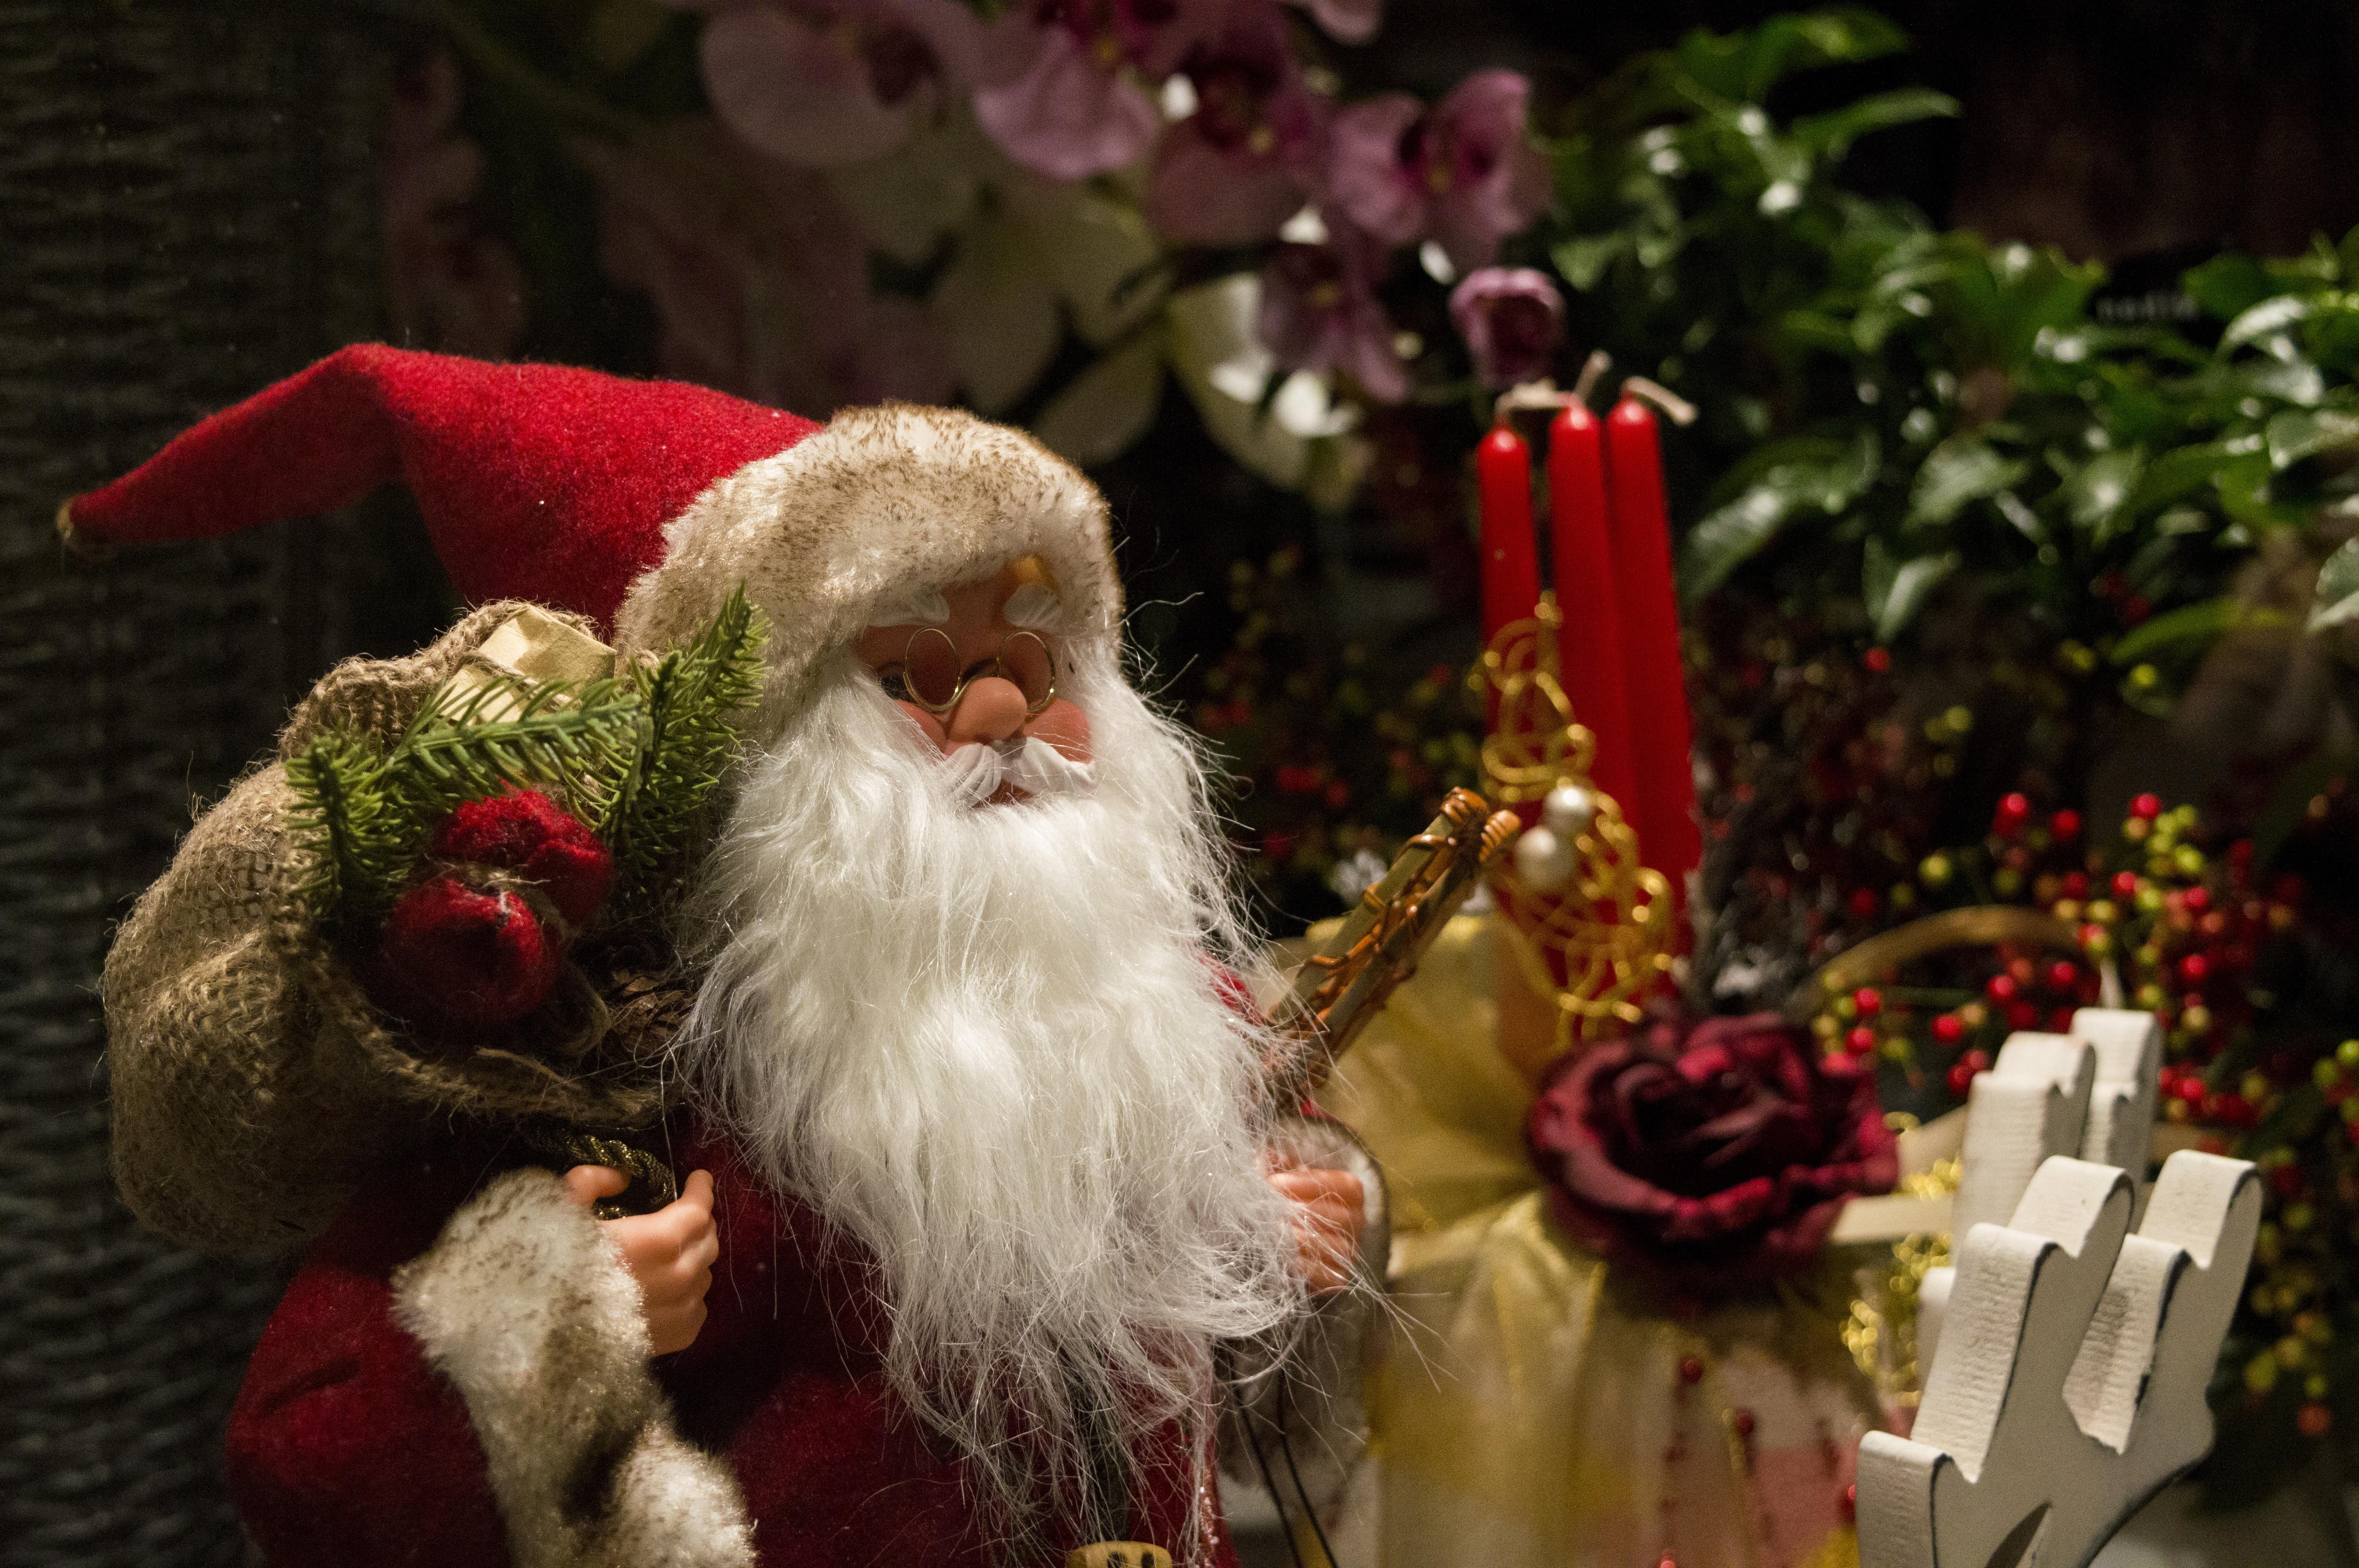 celebration decoration red holiday christmas decor santa happy grandpa xmas santa claus merry fictional character - Grandpa For Christmas